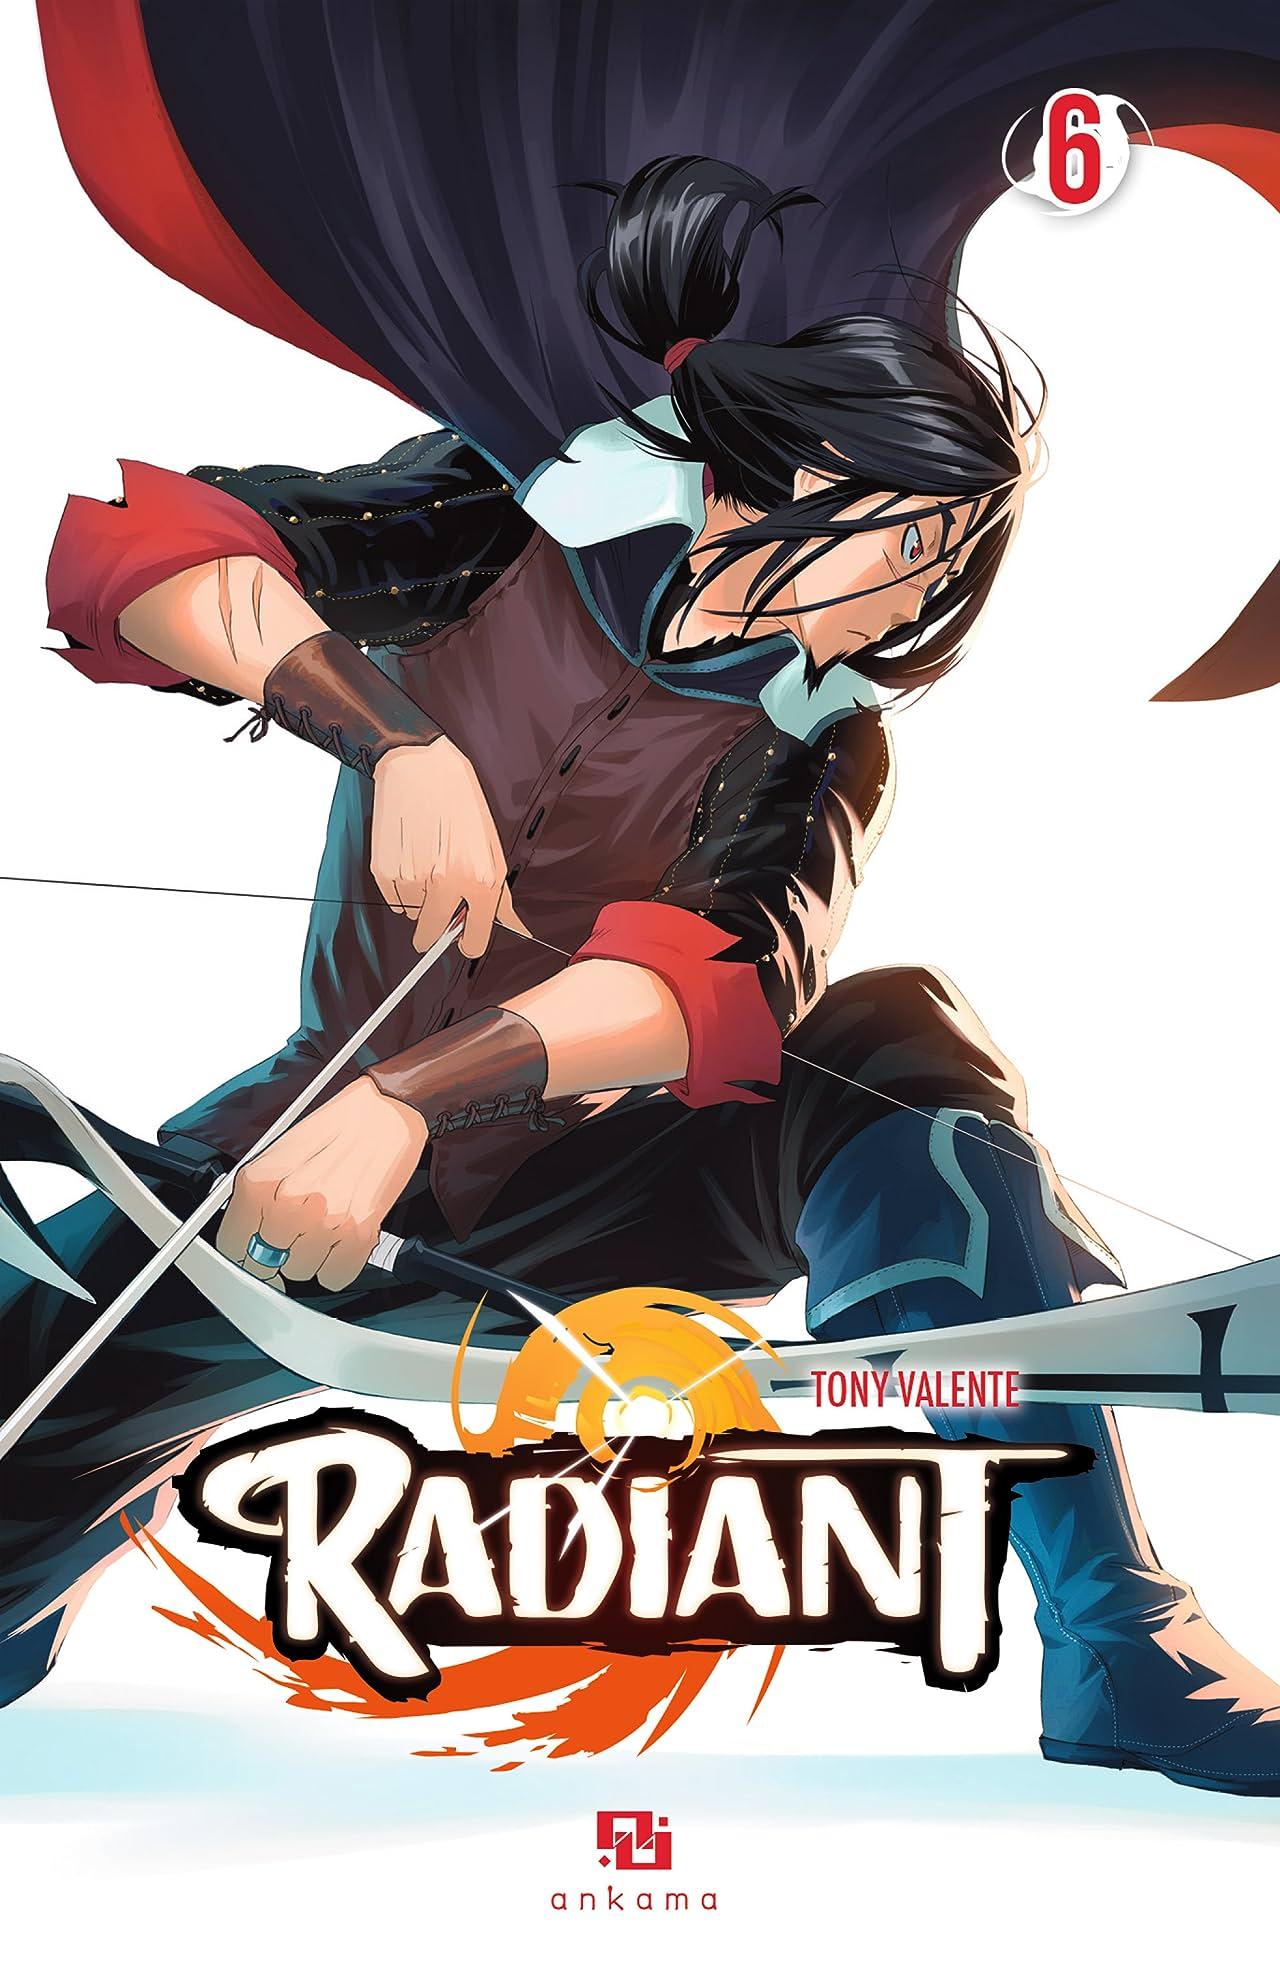 Radiant Vol. 6